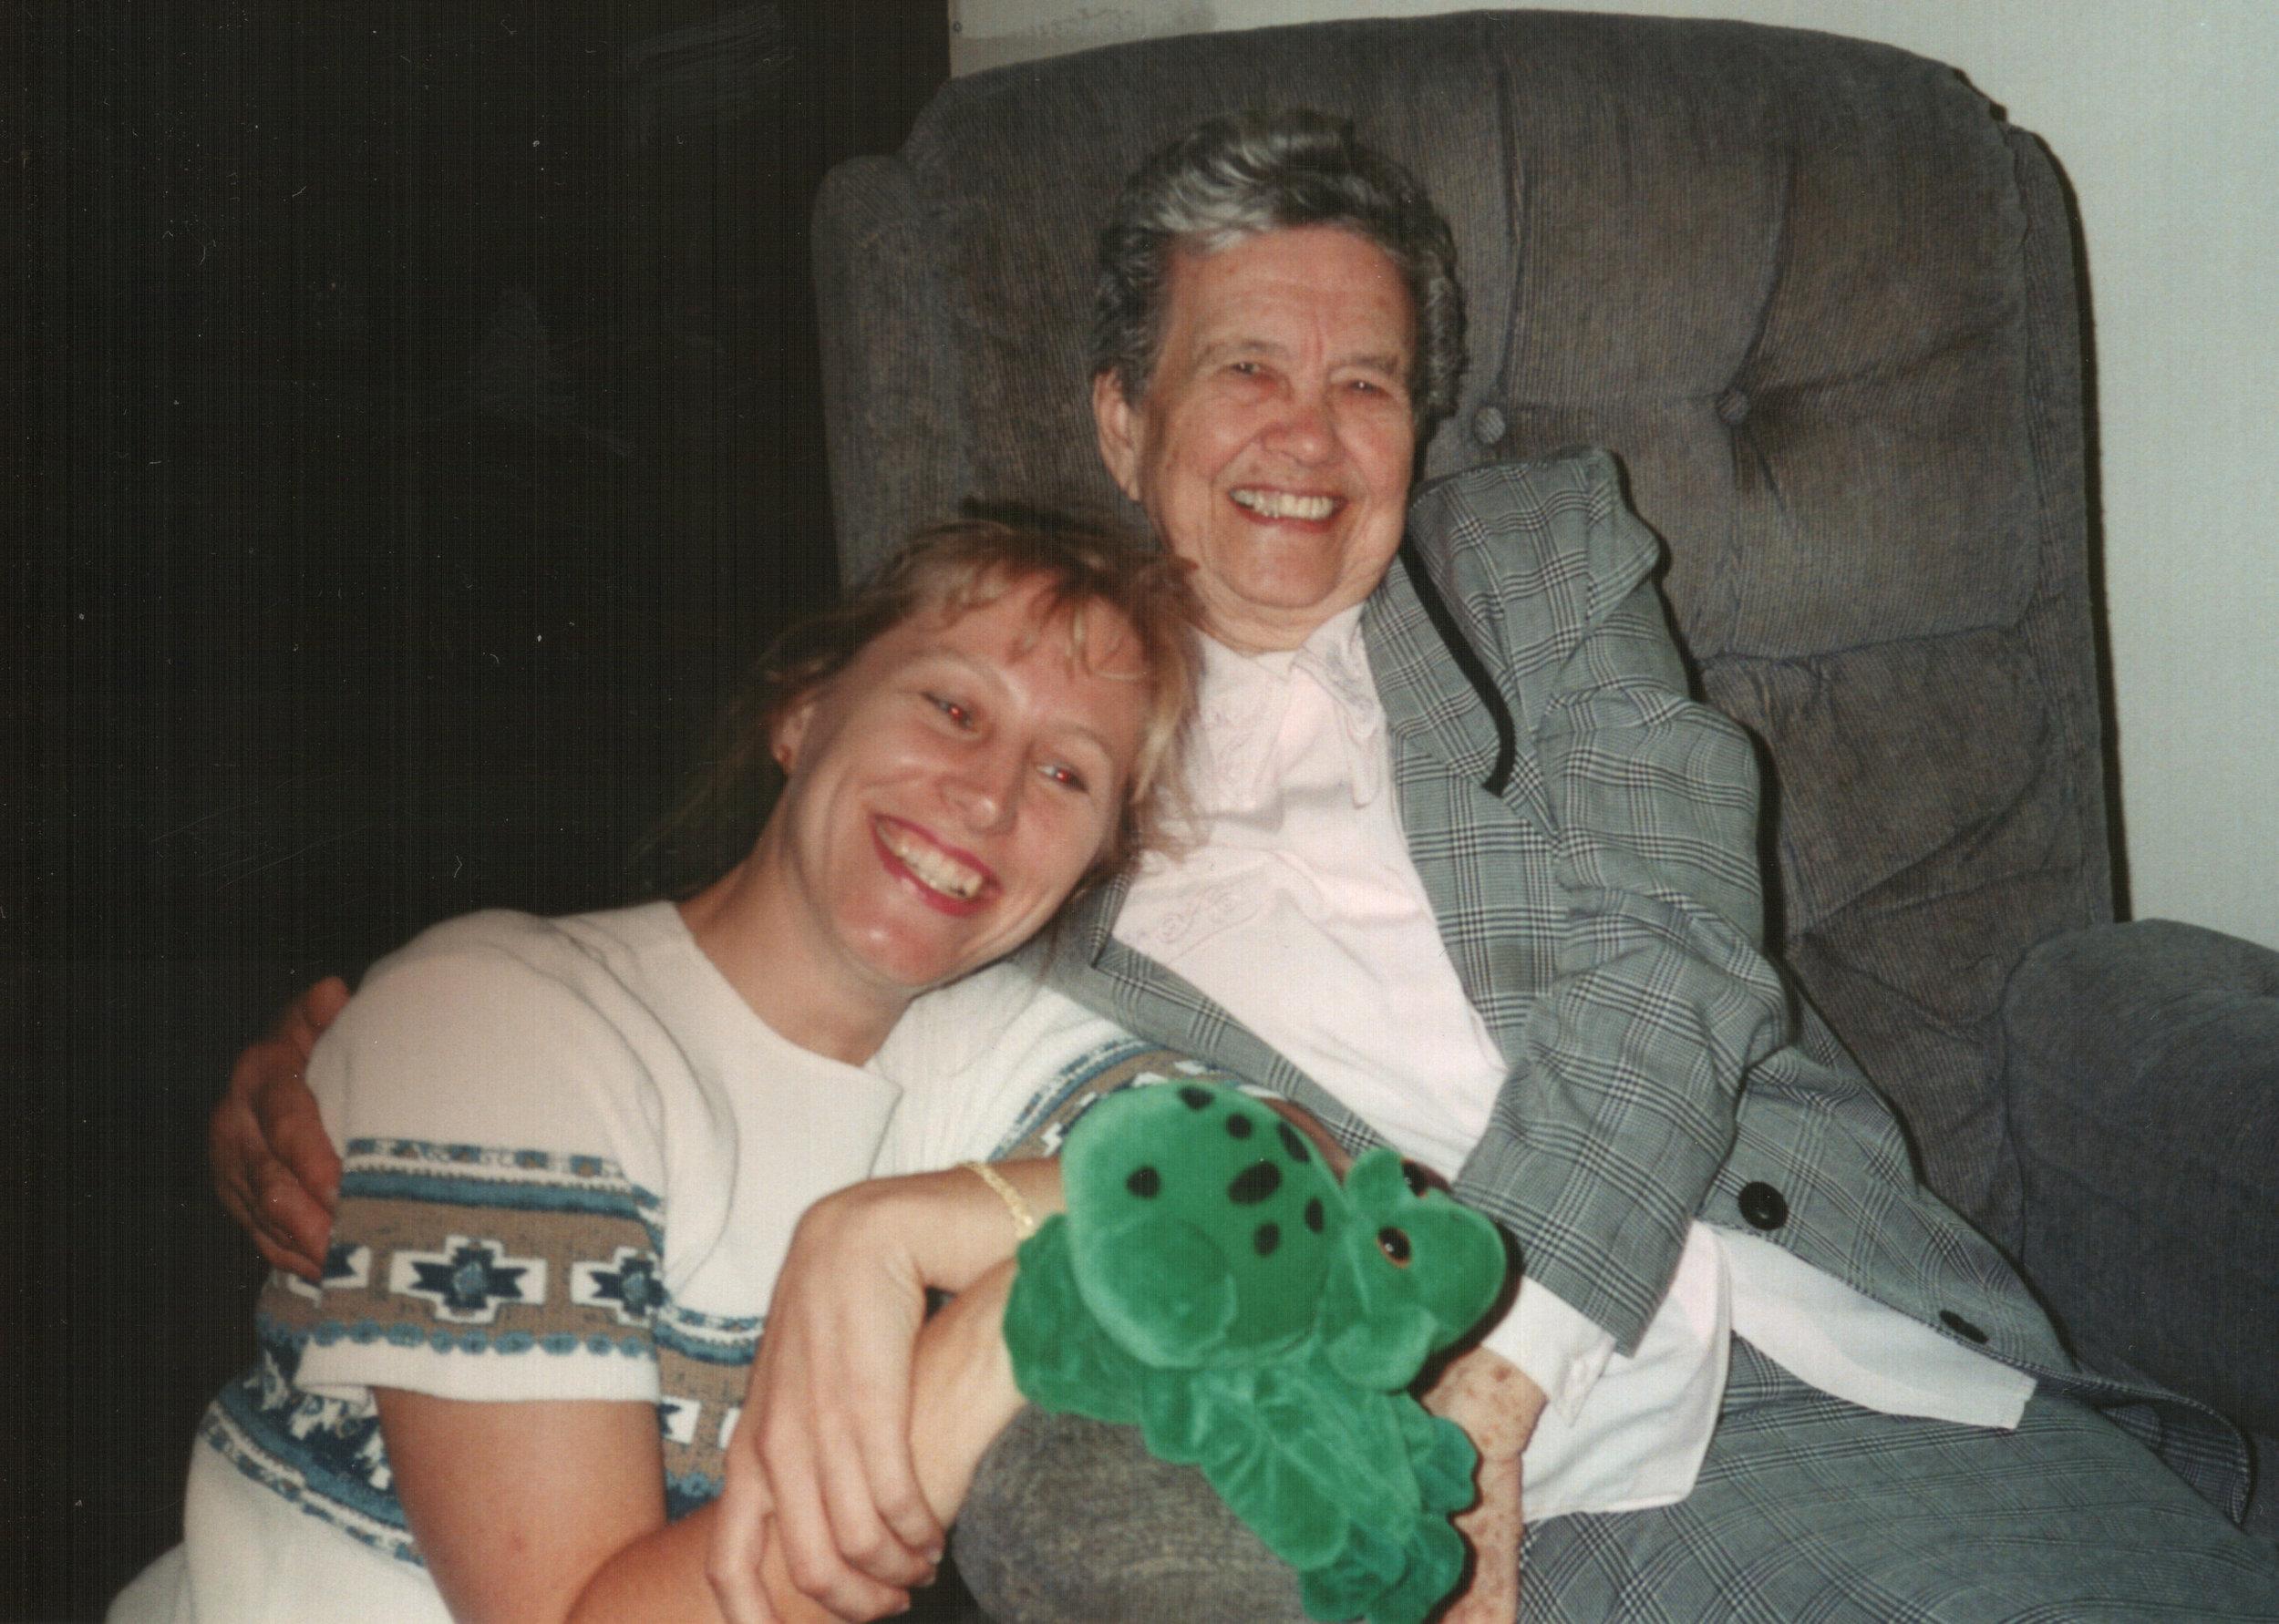 helene and grandma original 5x7 crop.jpg